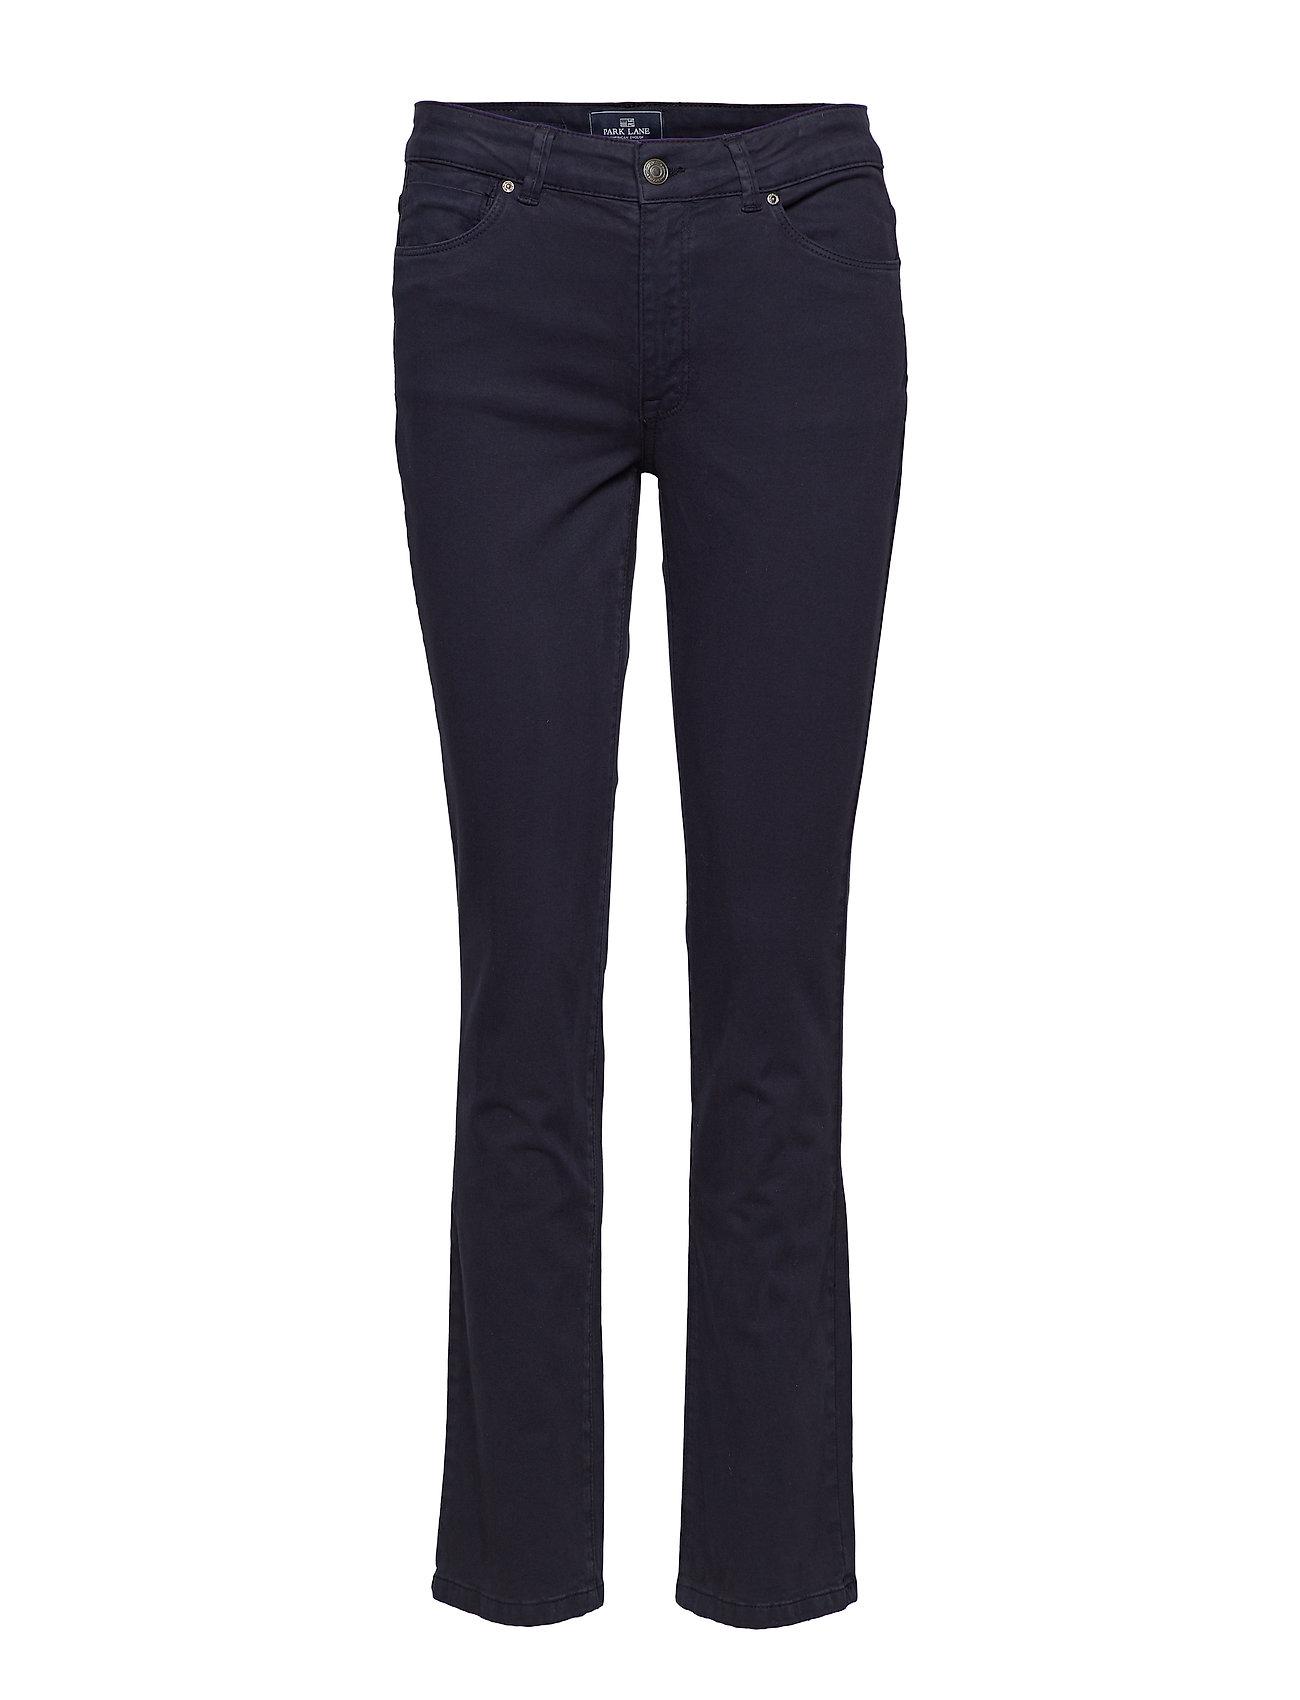 Park Lane MadisonTwill pants Jeans